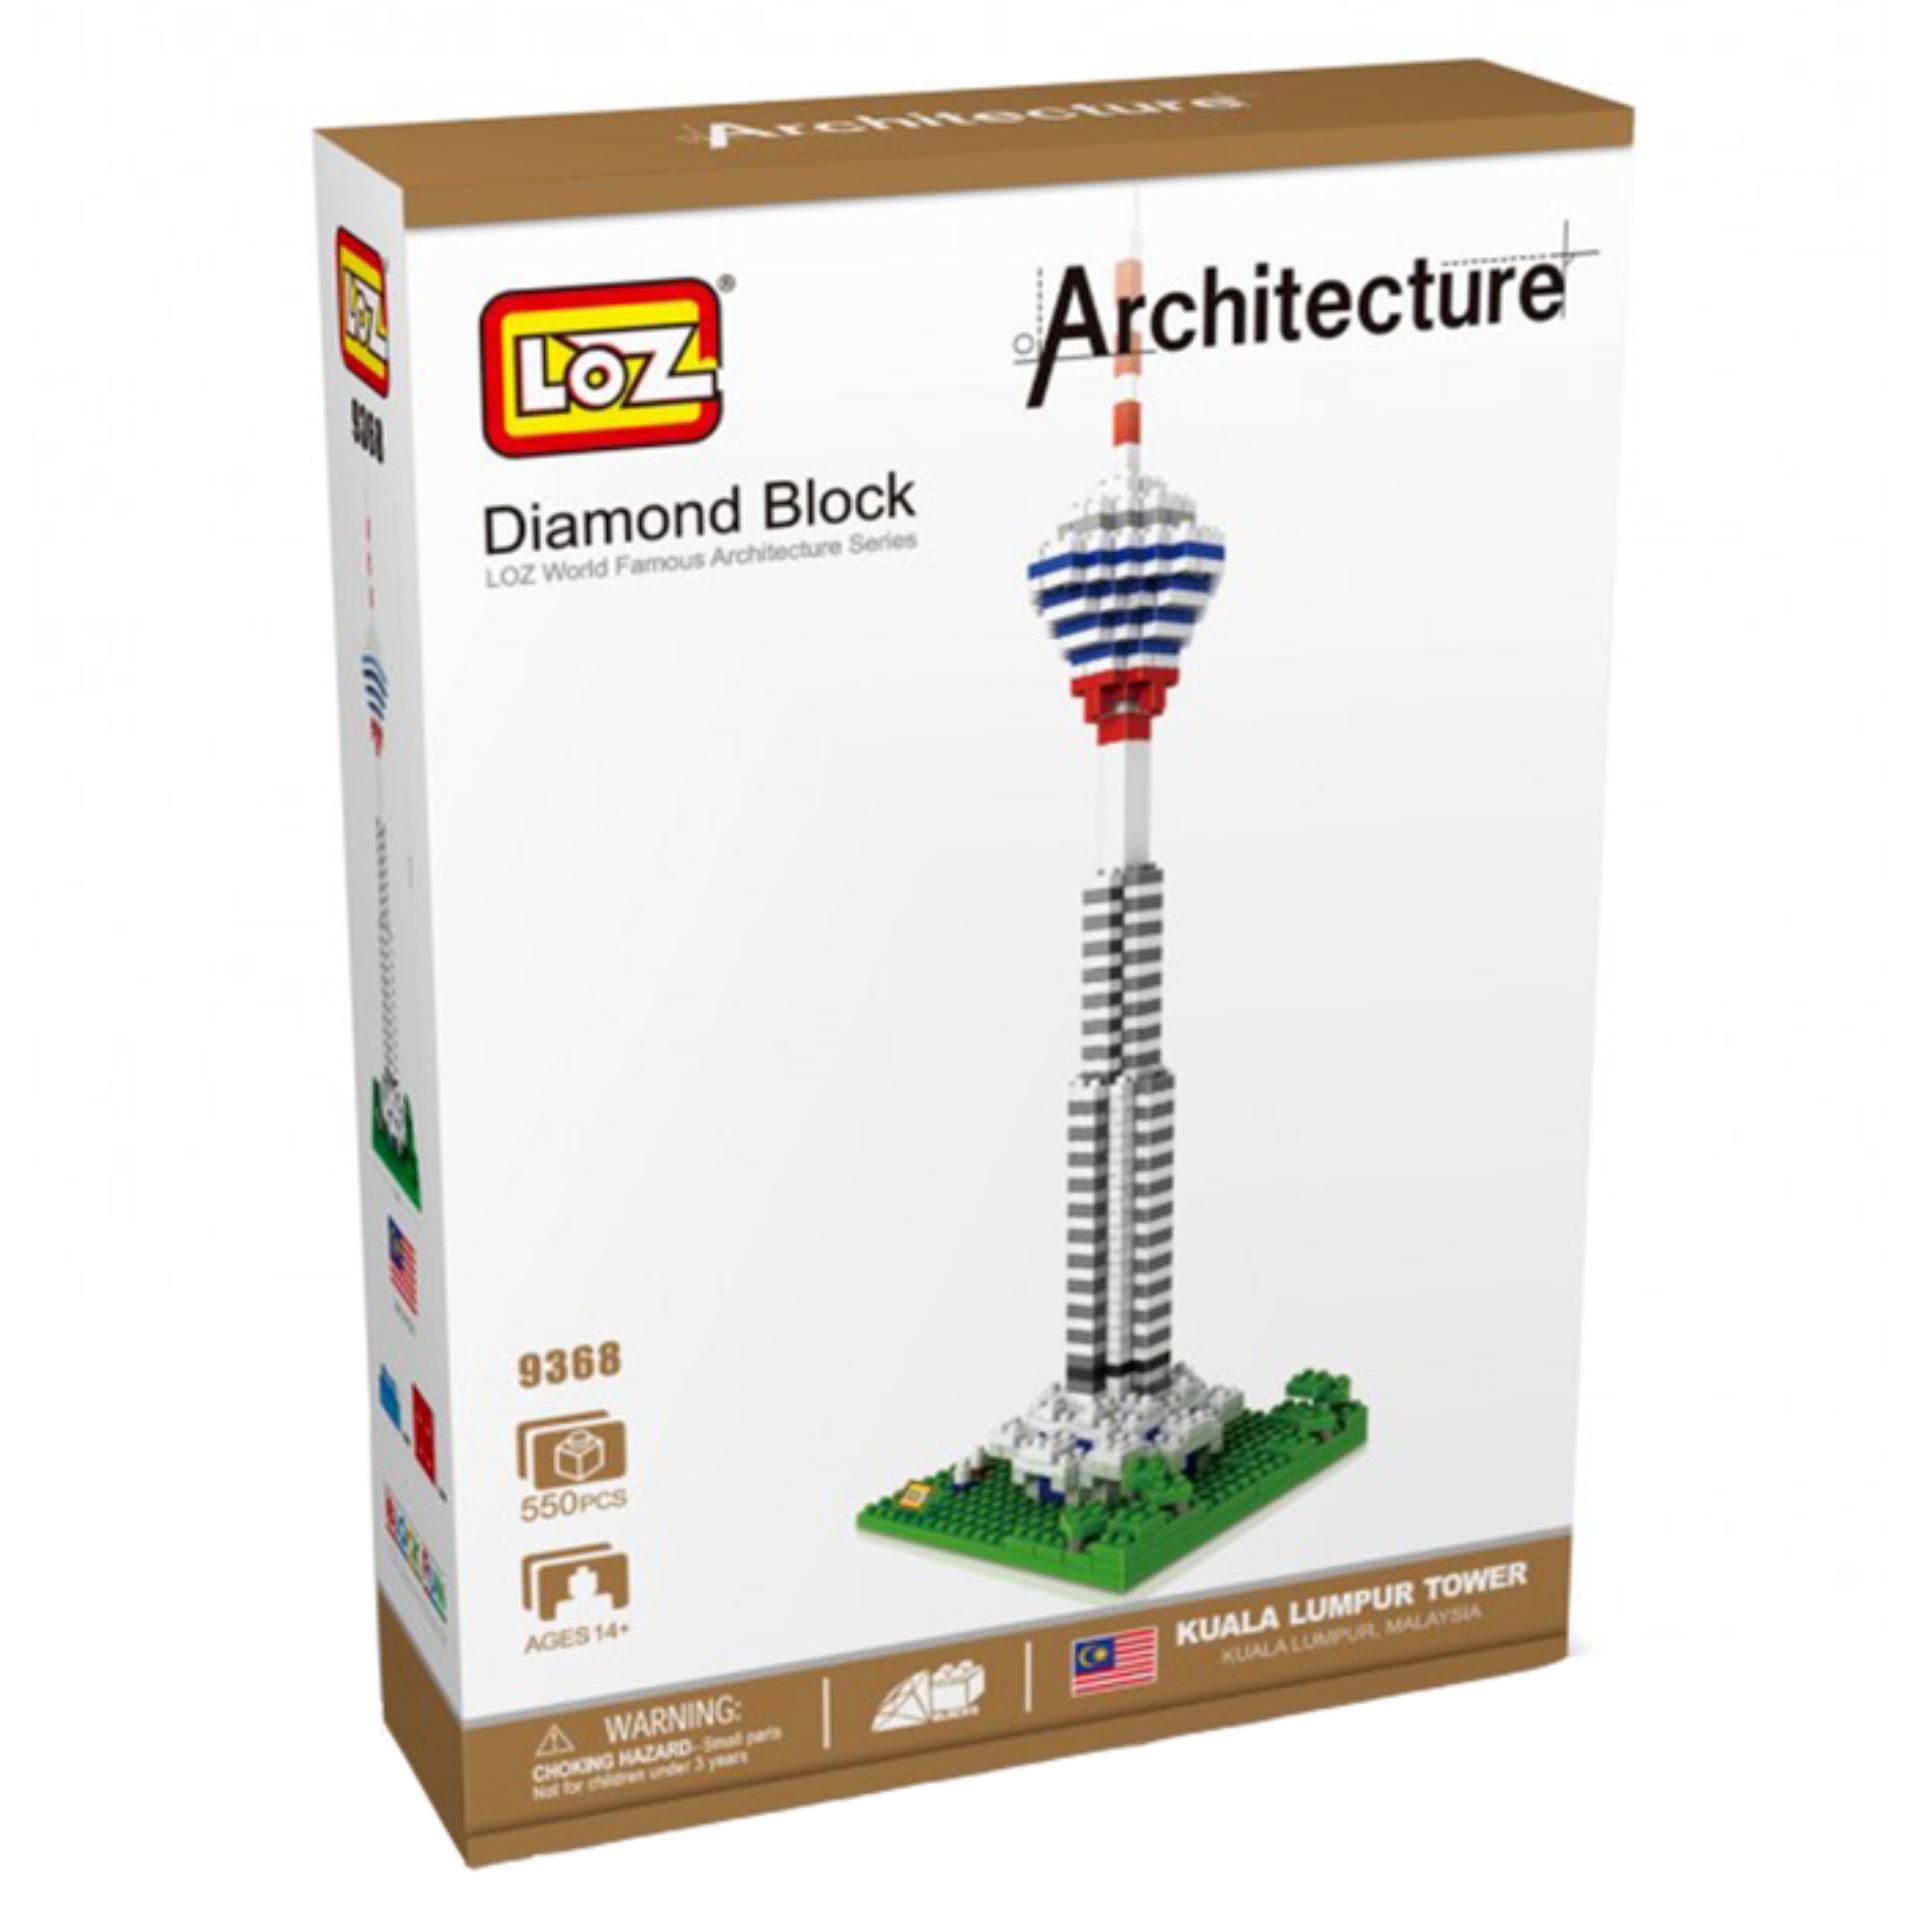 Architecture Kuala Lumpur Tower - Original Lego LOZ Diamond Block Mainan Edukasi